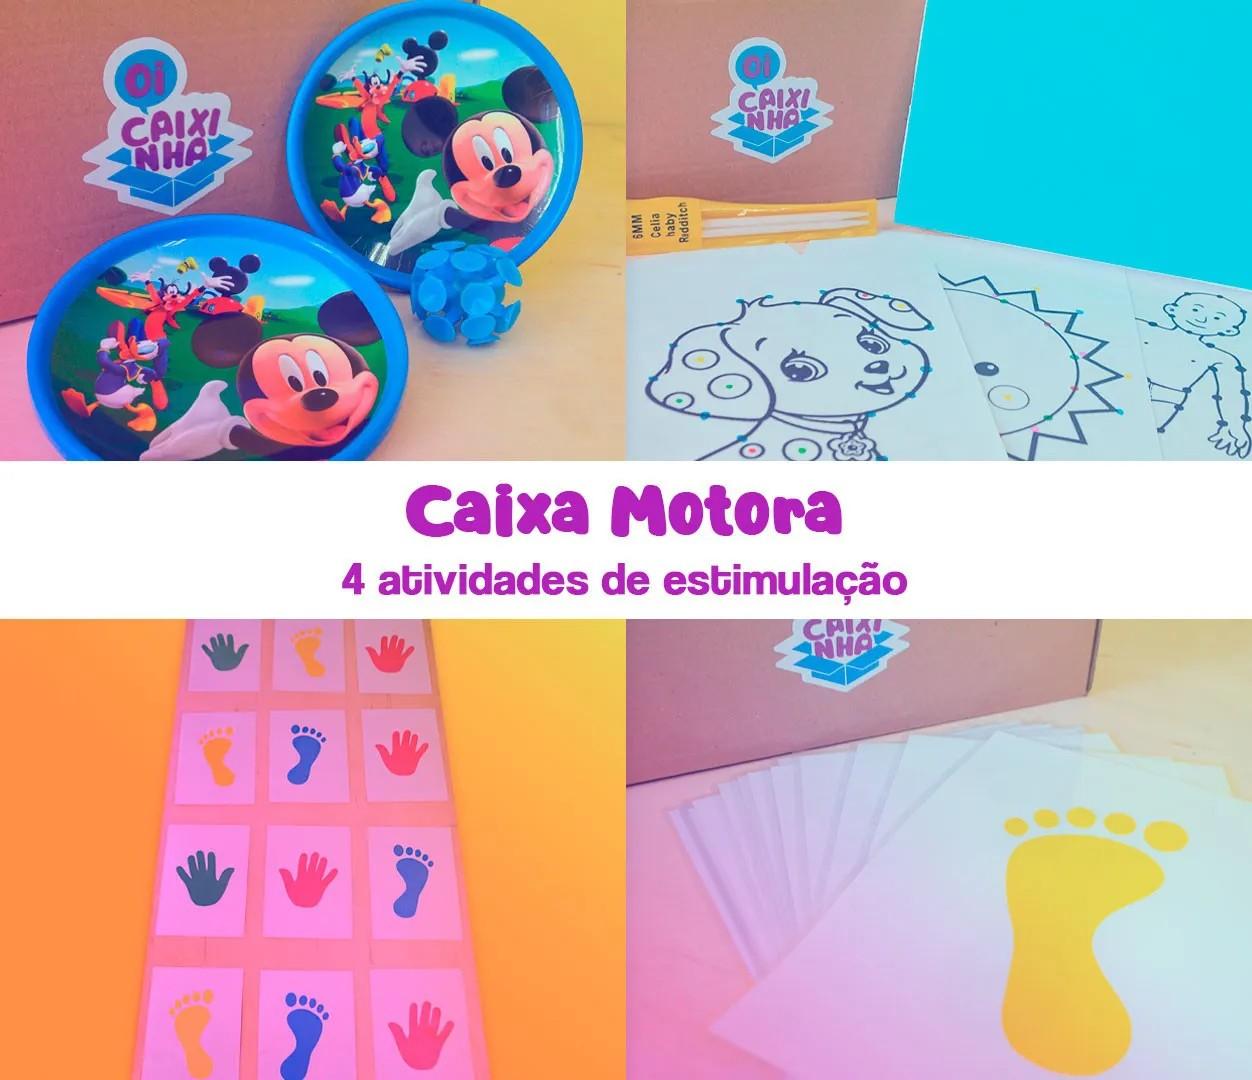 CAIXA MOTORA